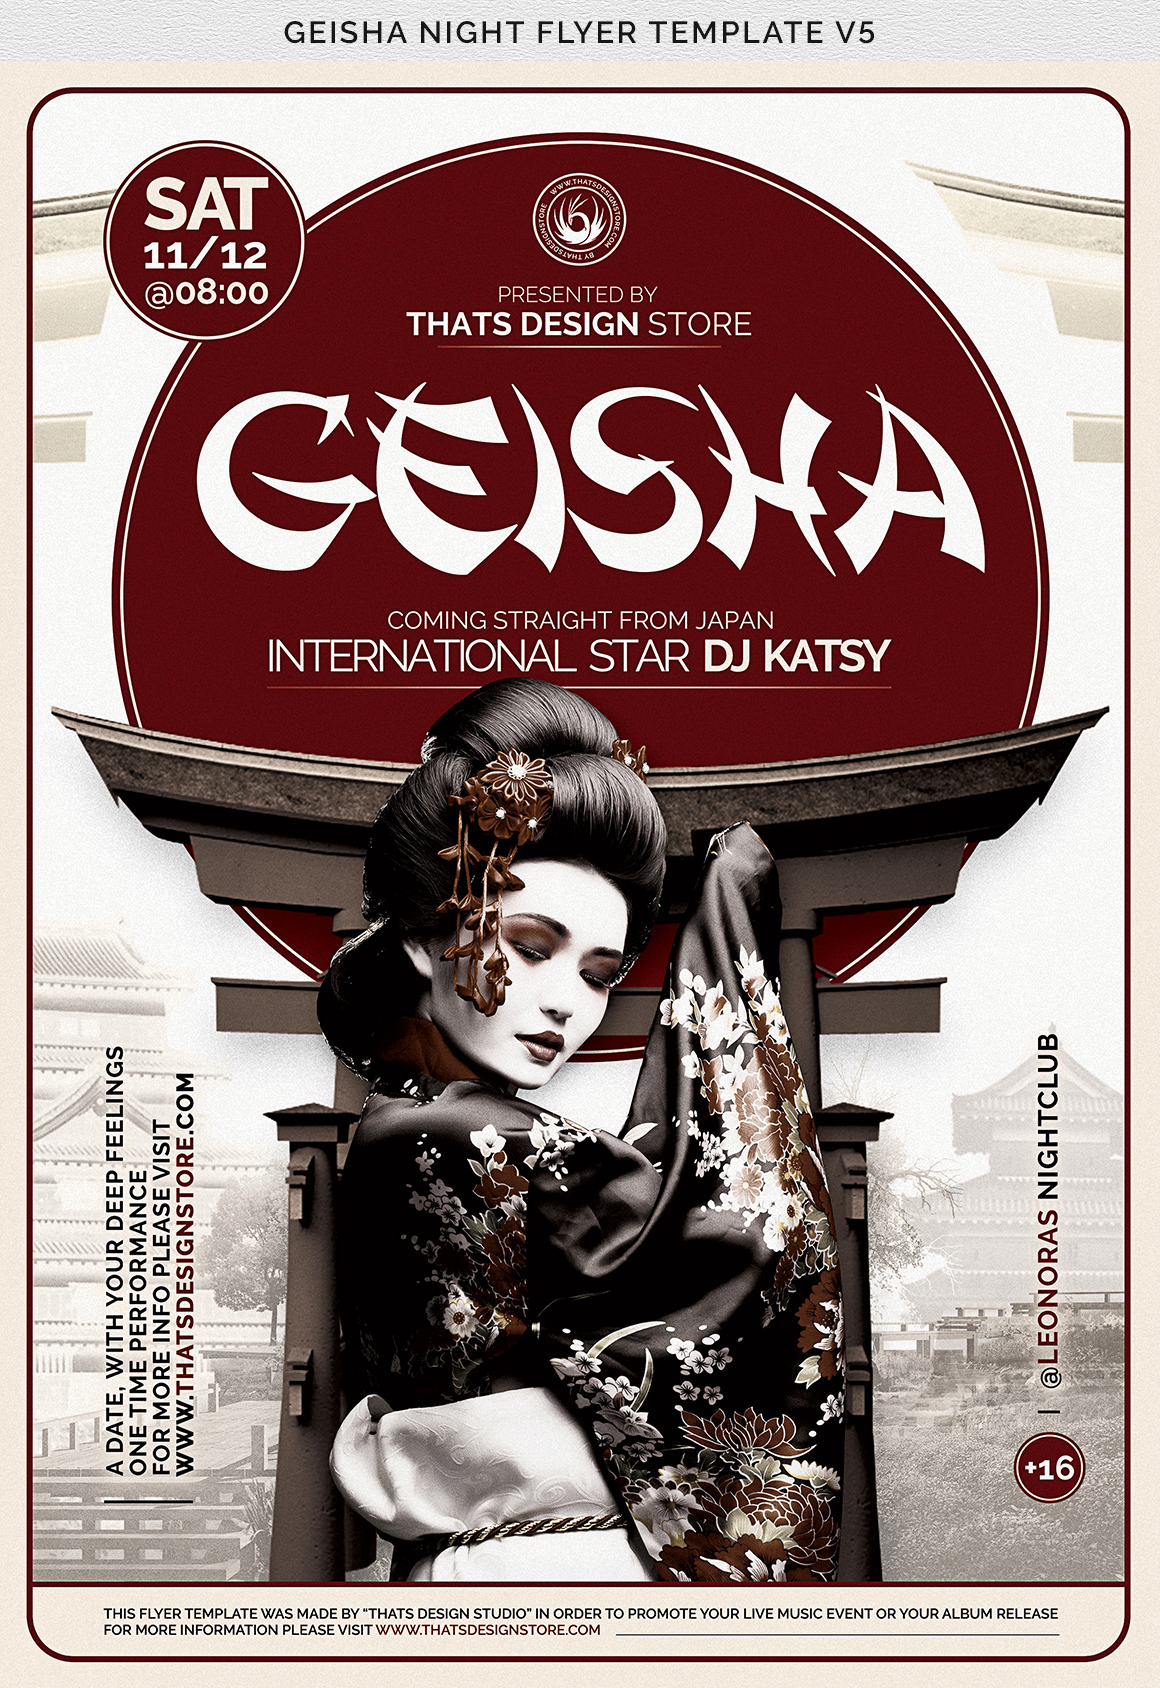 Geisha Night Flyer Template V5 example image 7